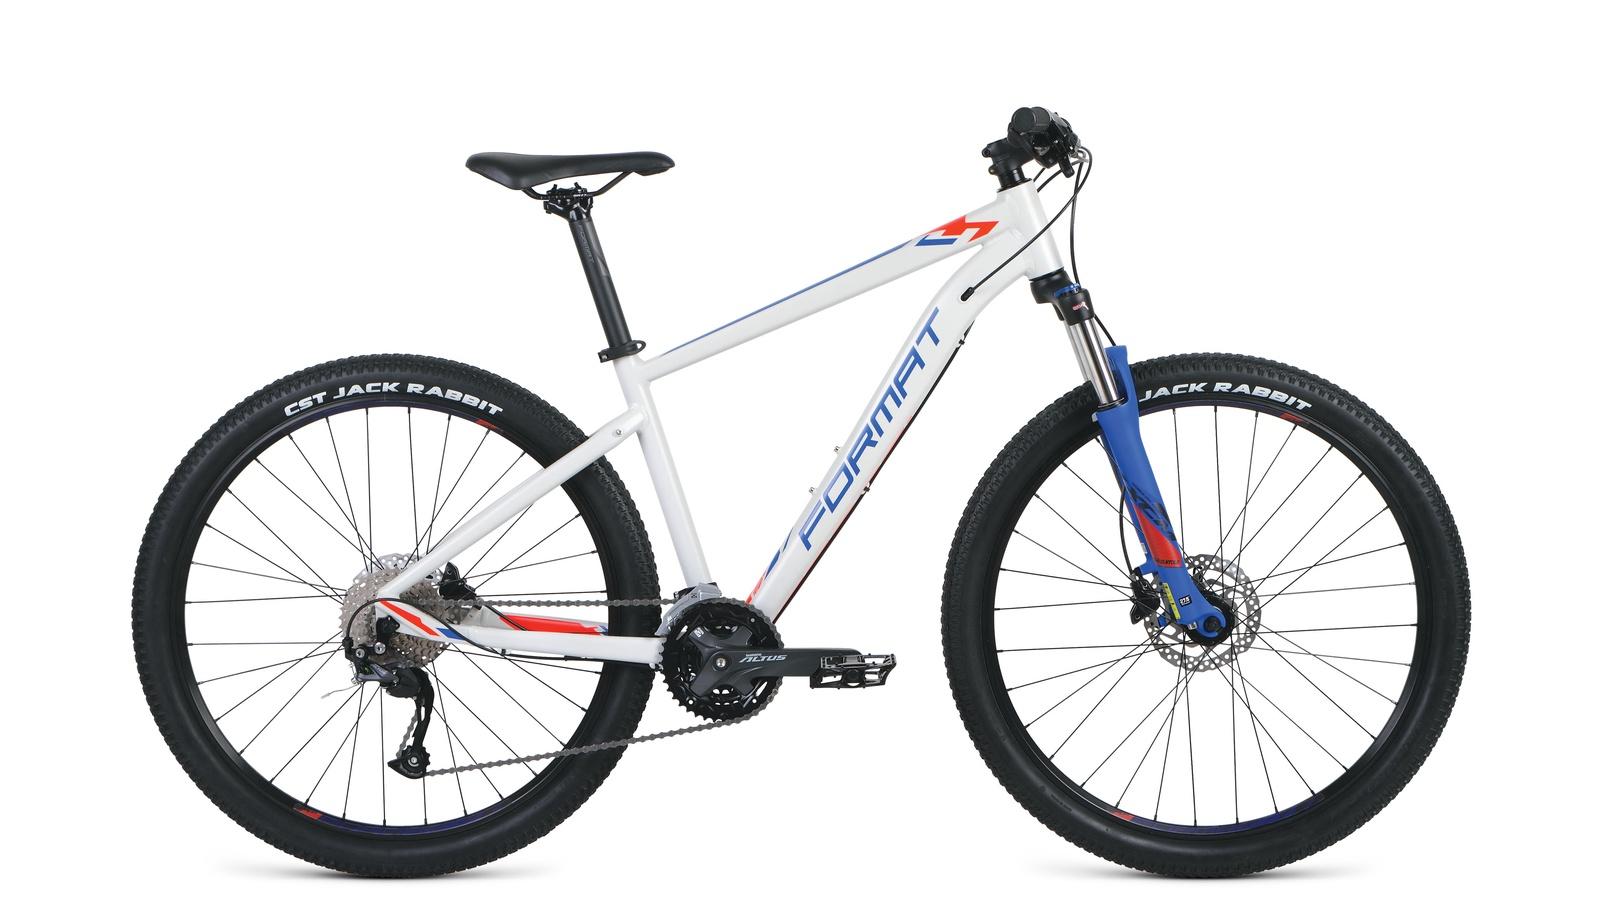 цена на Велосипед Format RBKM9M67S011, белый